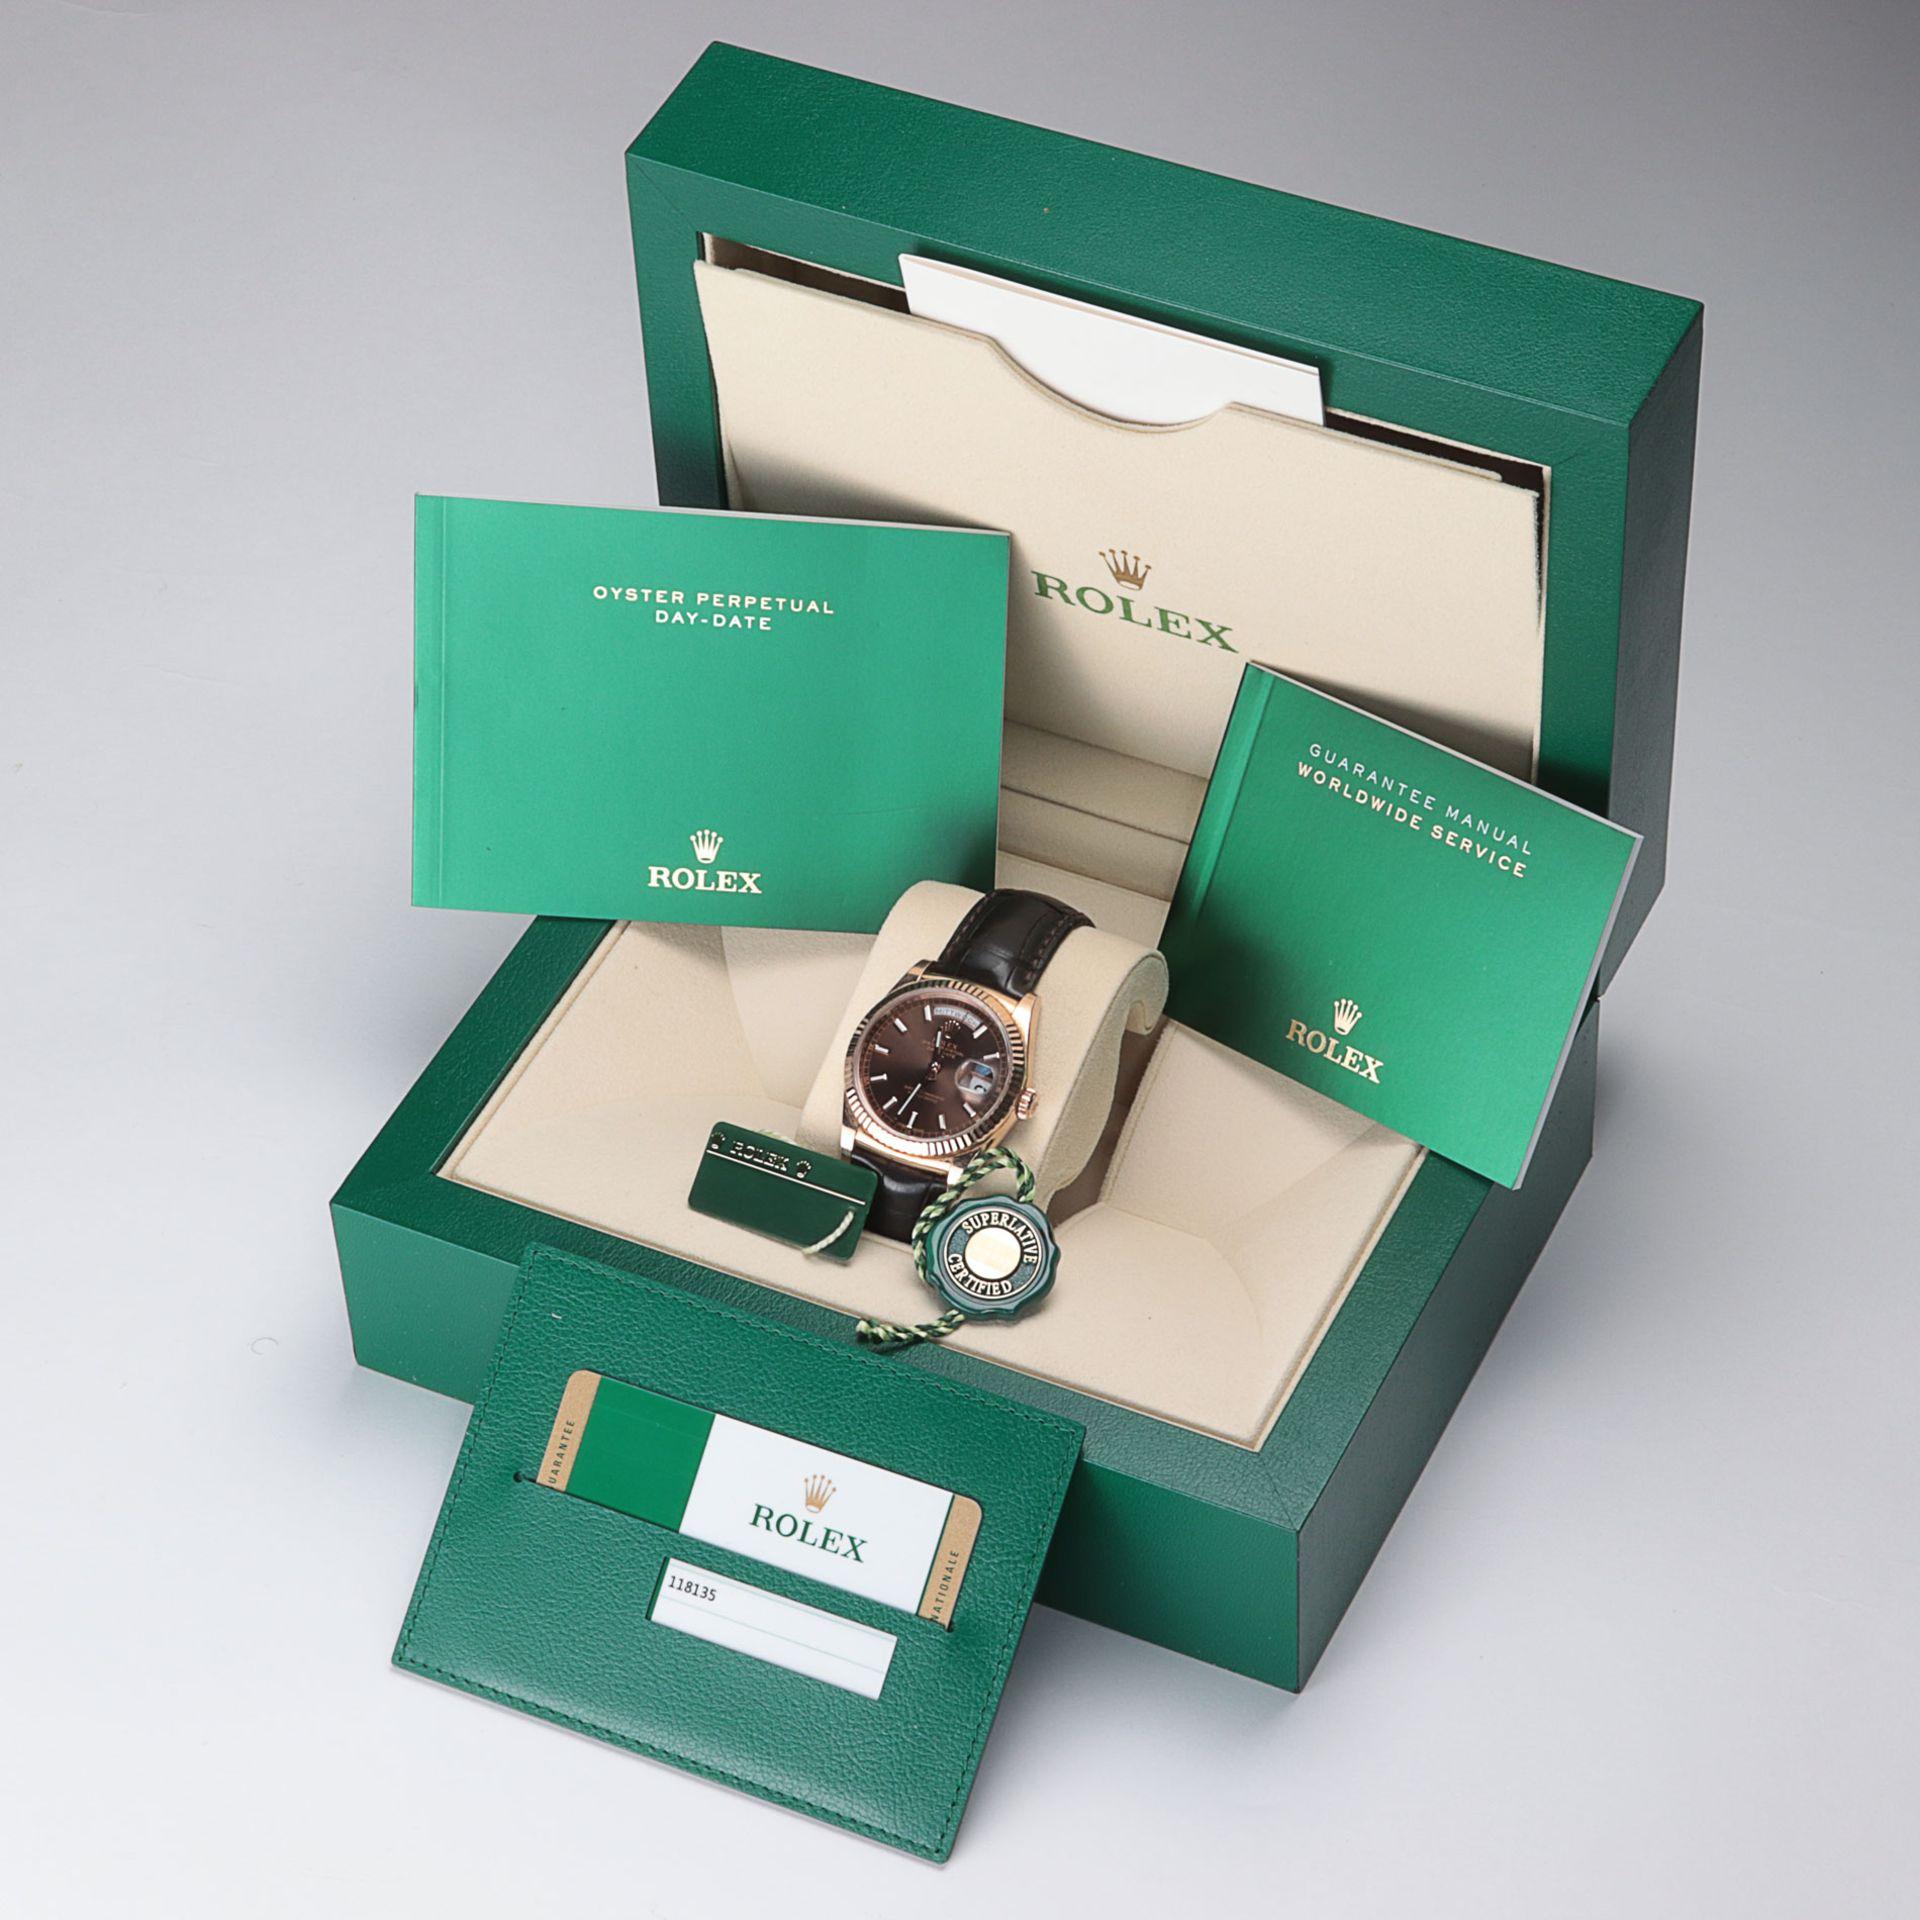 Rolex - Herrenarmbanduhr Roségold 750, Rolex Day-Date Oyster Perpetual, Superlative C